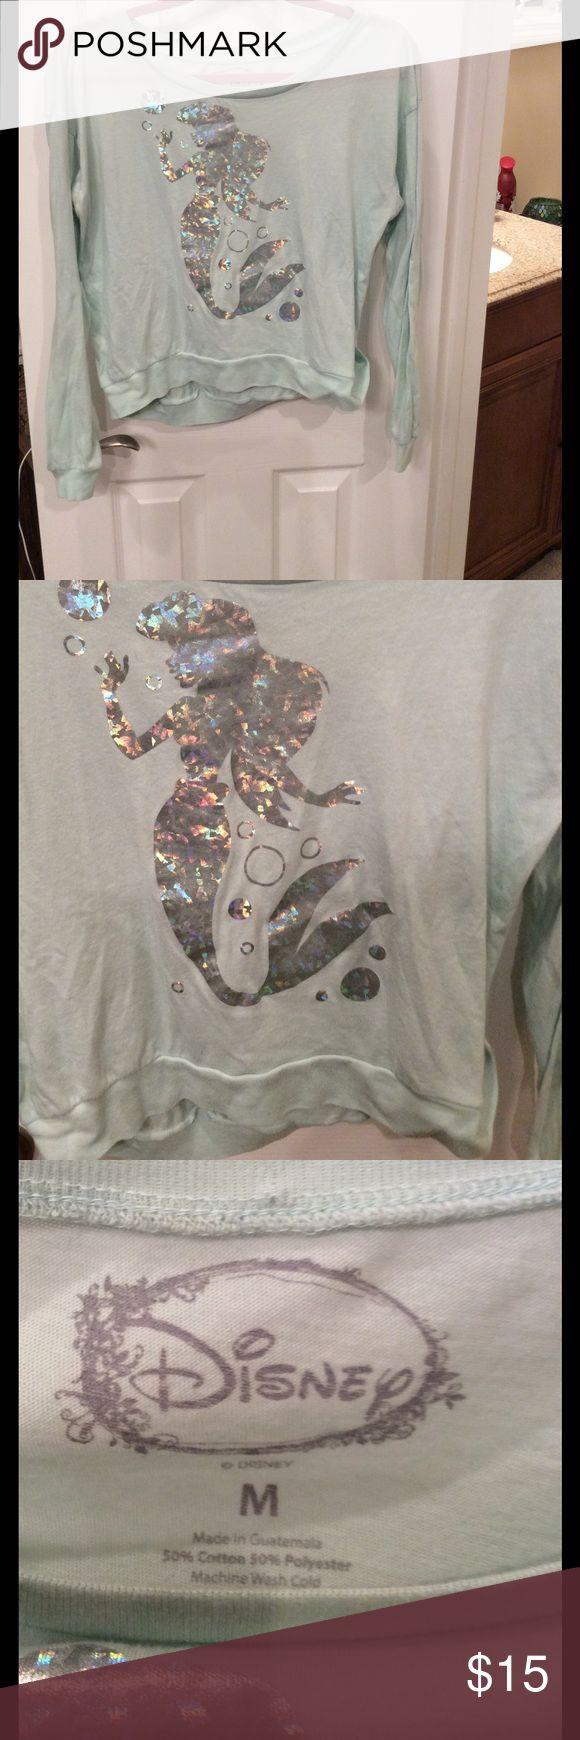 Disney little mermaid top Long sleeve mint green shirt with Little Mermaid metallic decal Disney Tops Tees - Long Sleeve